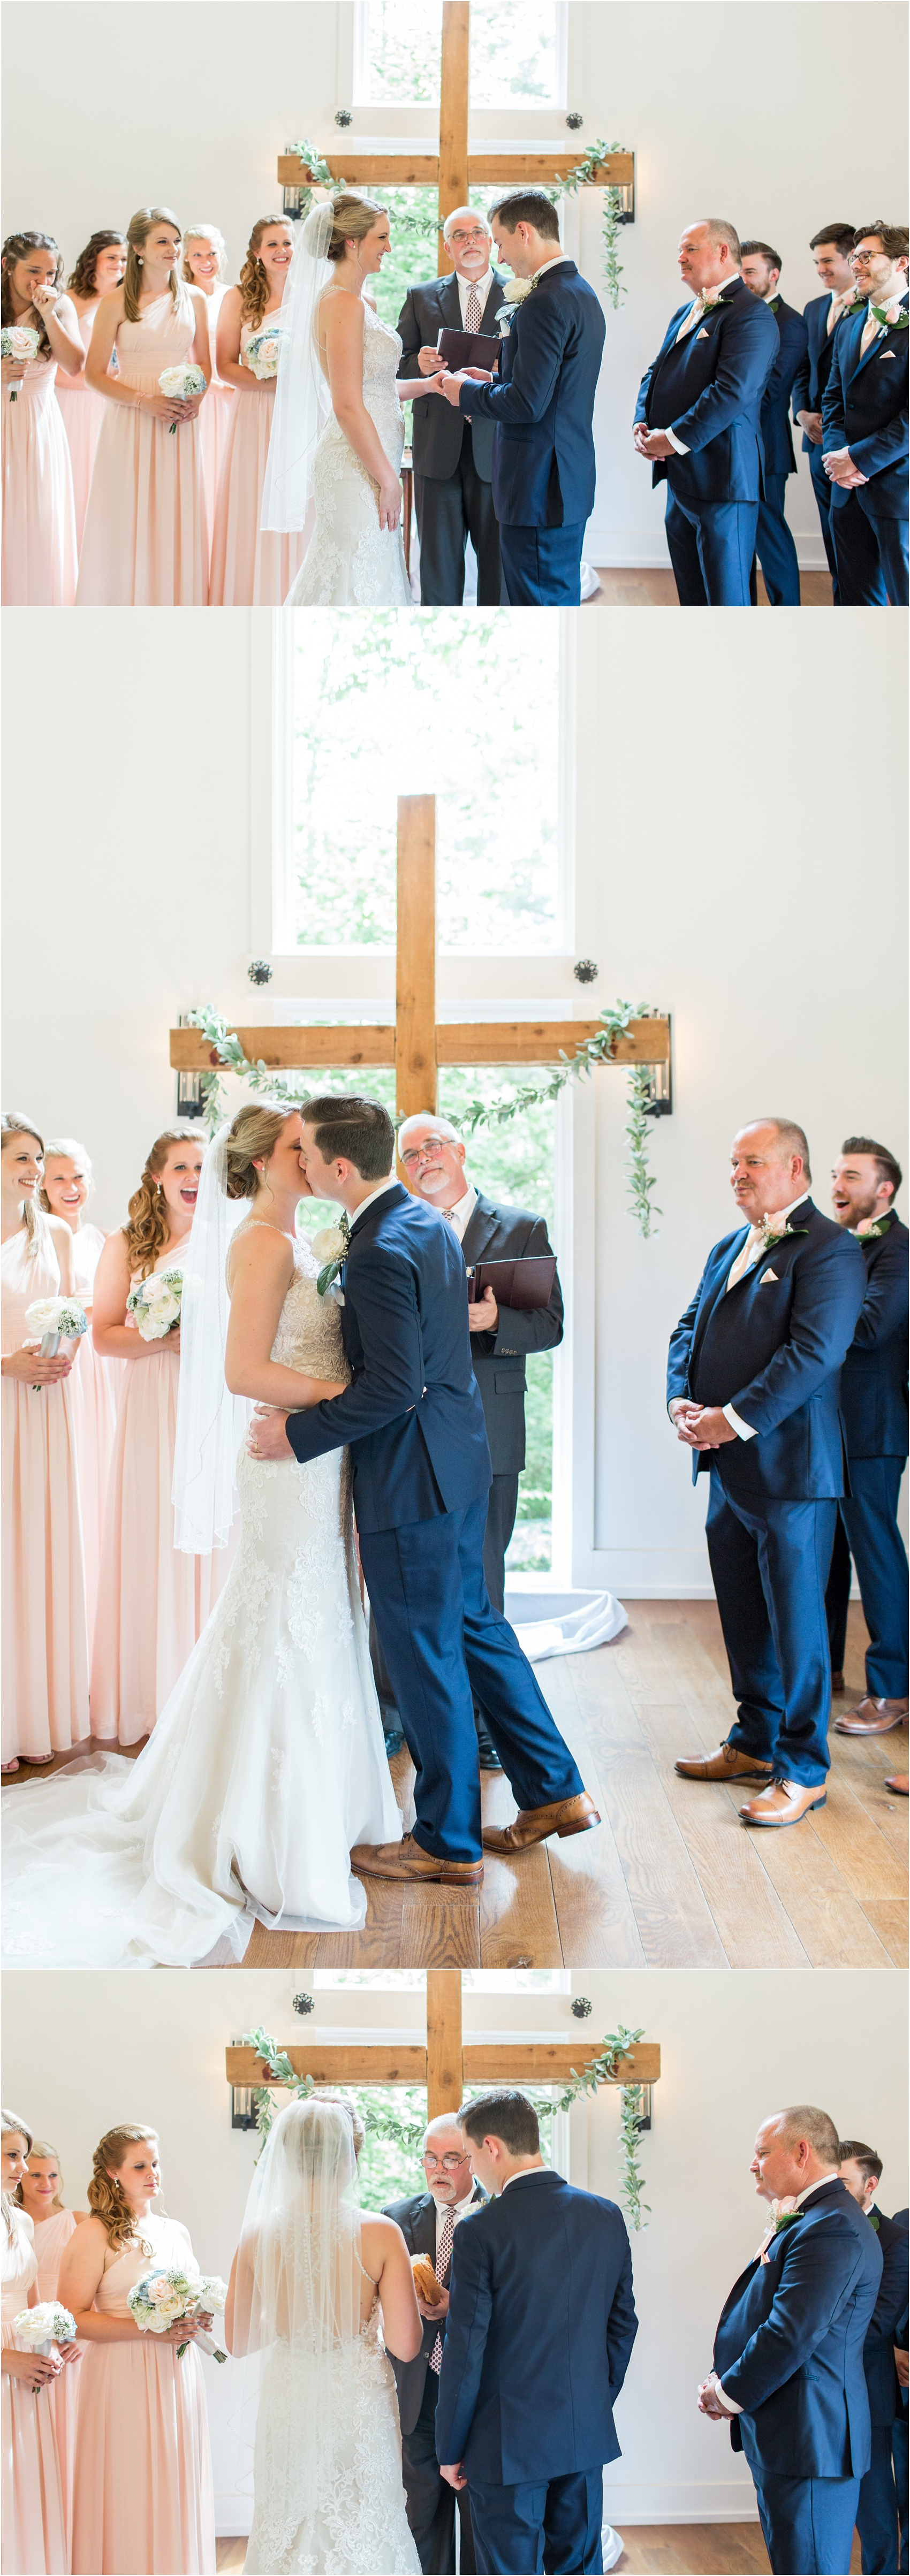 Savannah Eve Photography- Roper-Powell Wedding- Blog-32.jpg